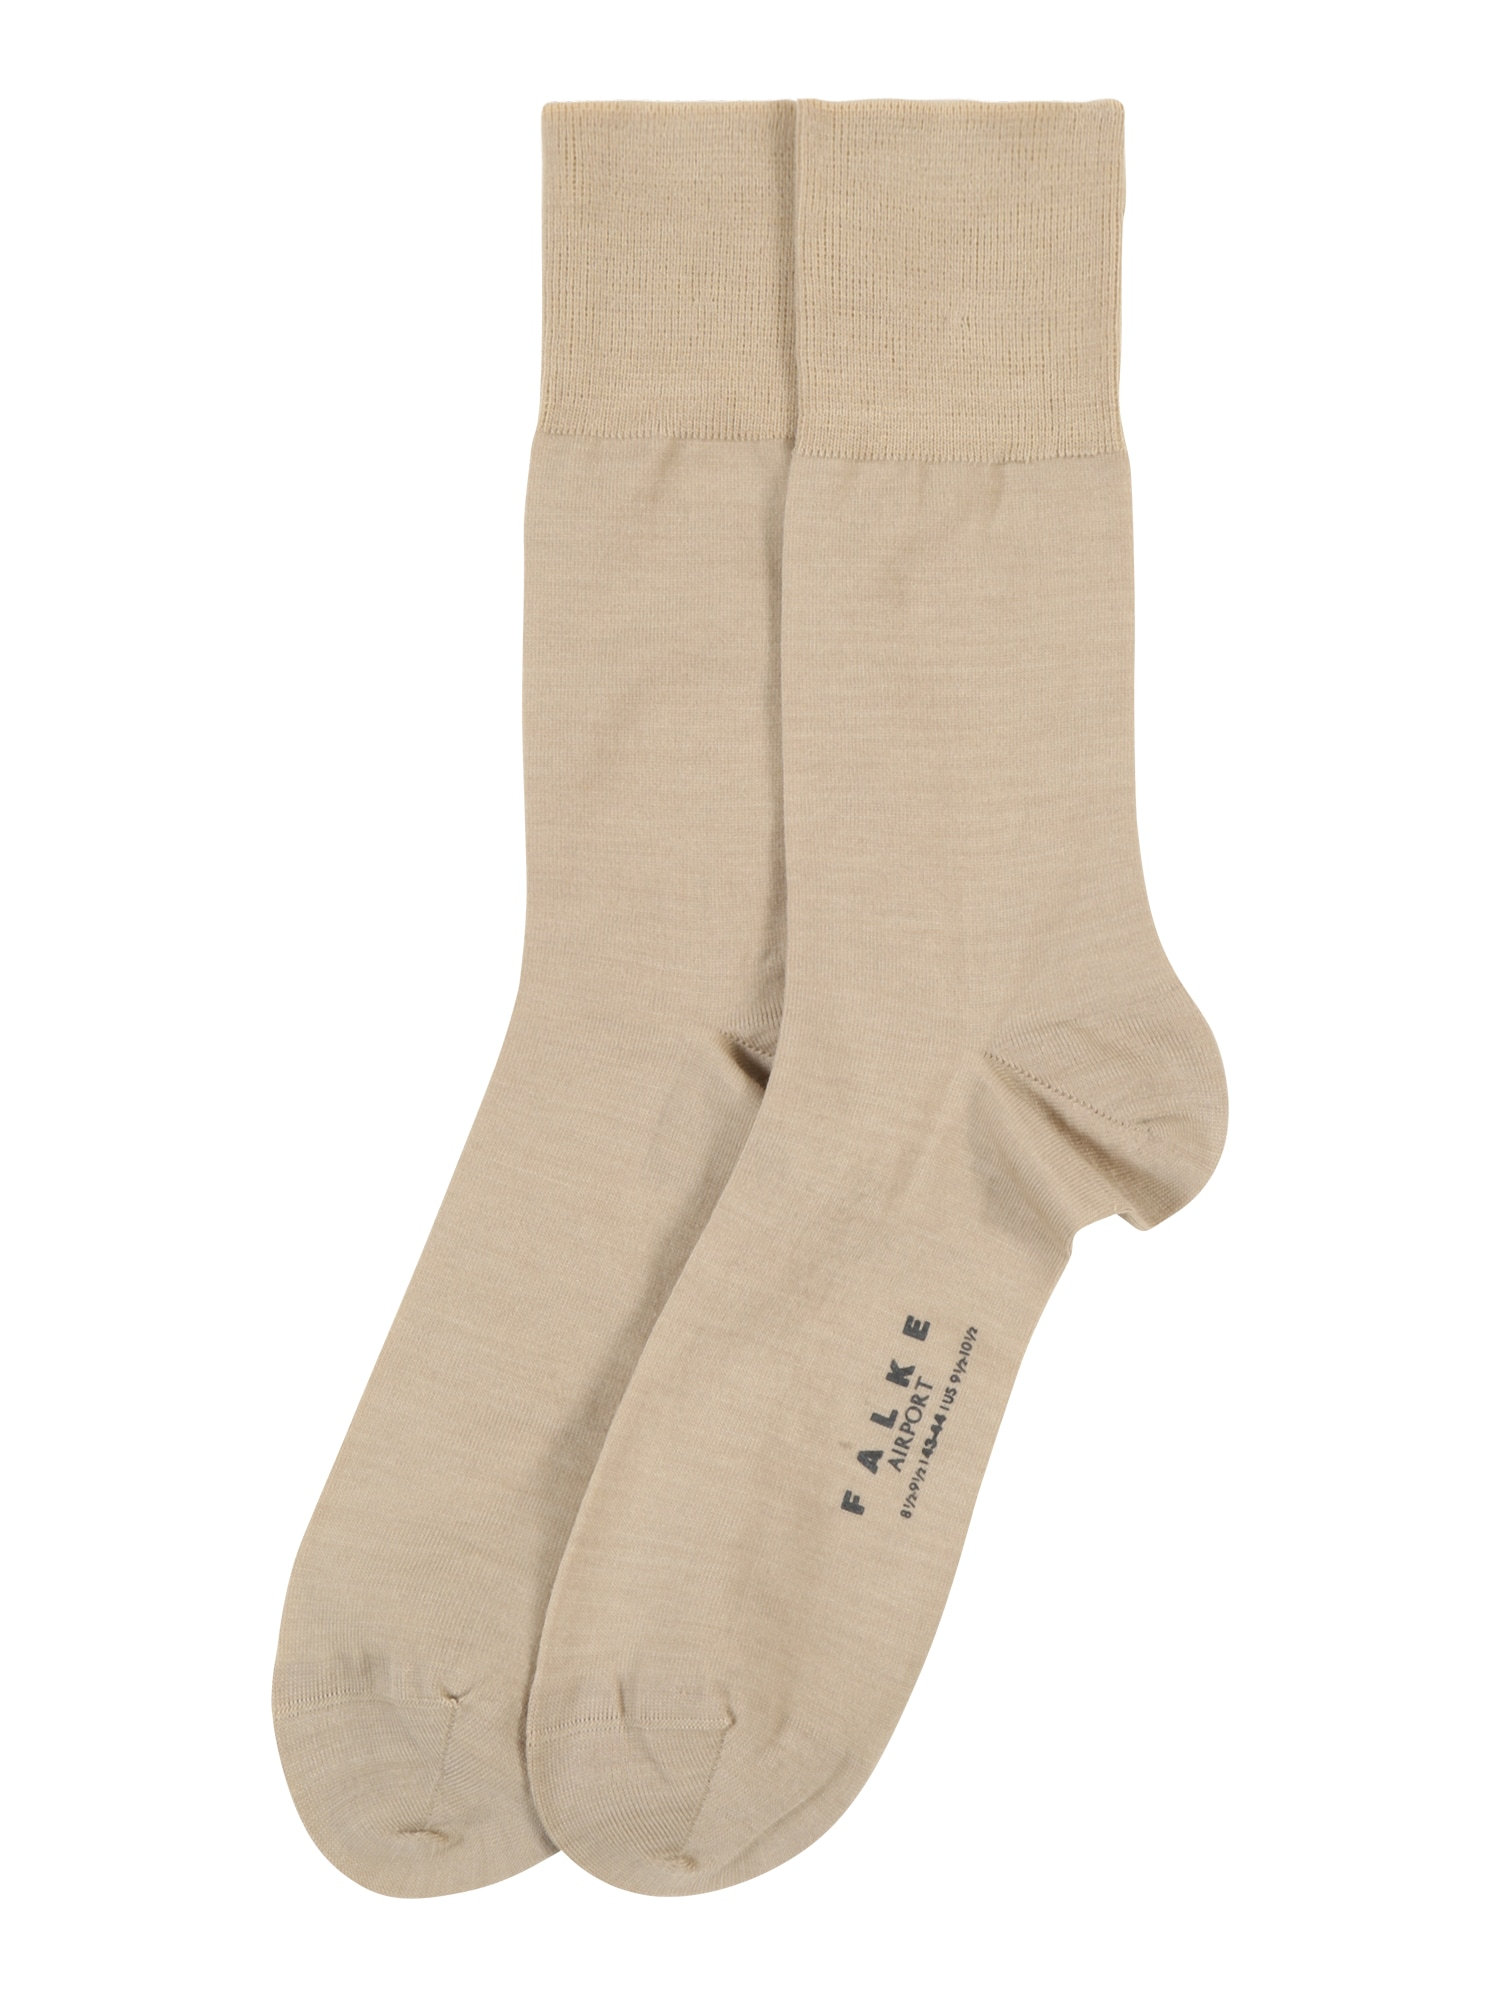 Ponožky Airport písková FALKE